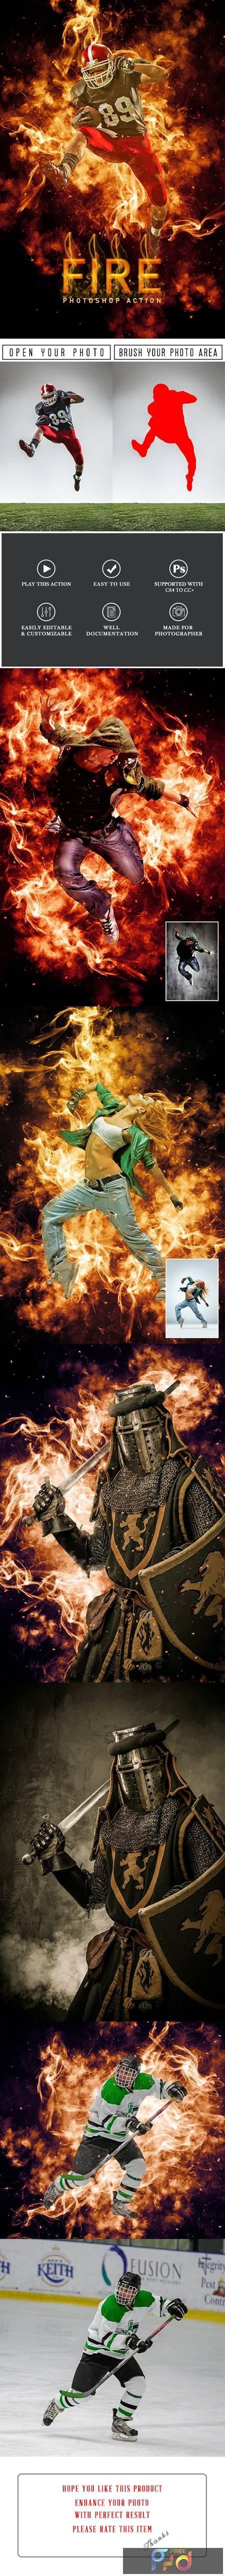 Fire Photoshop Action 29628249 1